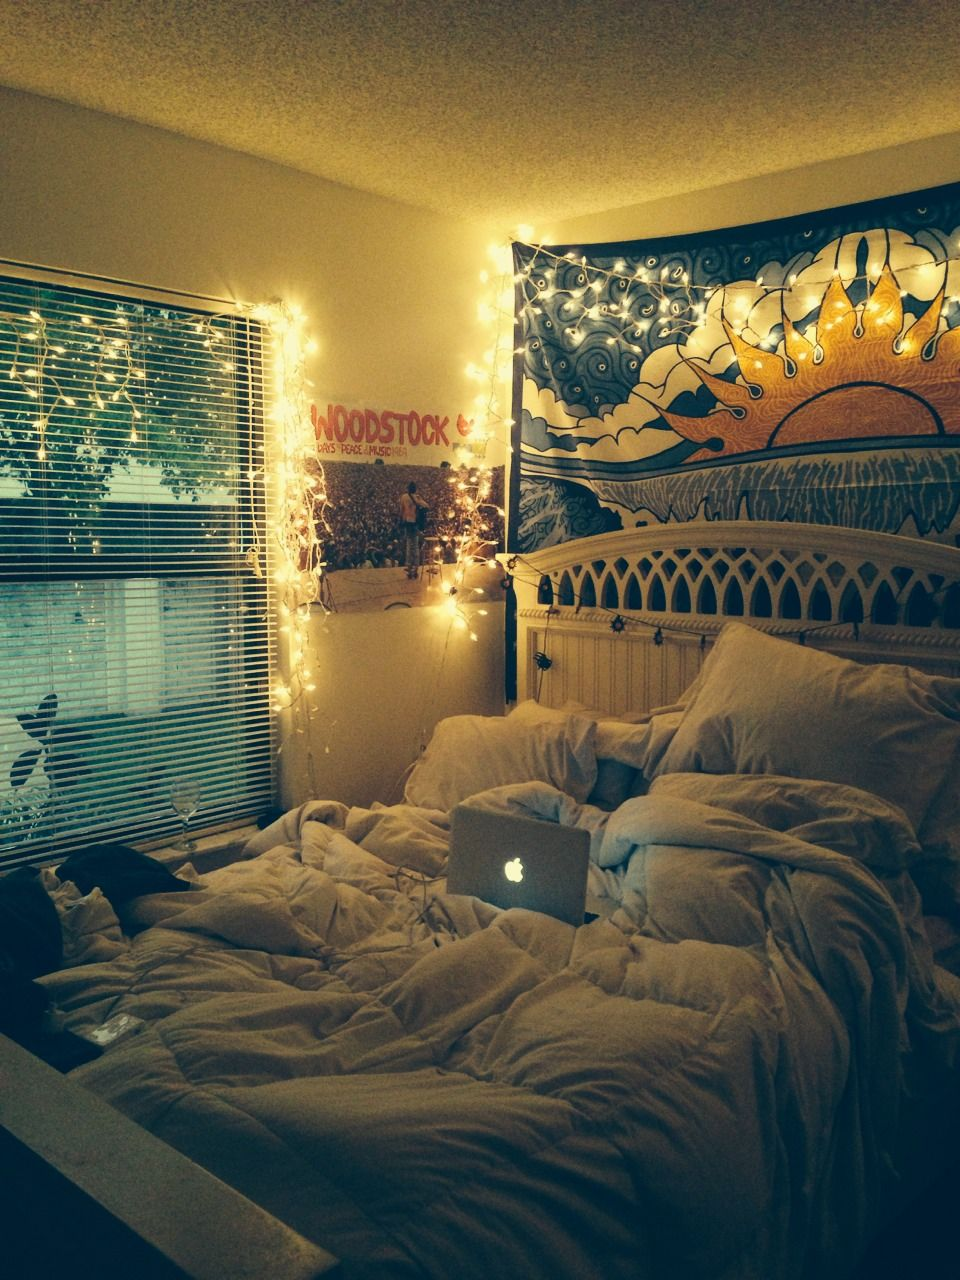 This Room Looks So Cozy Aesthetic Bedroom Tumblr Bedroom Tumblr Bedroom Decor